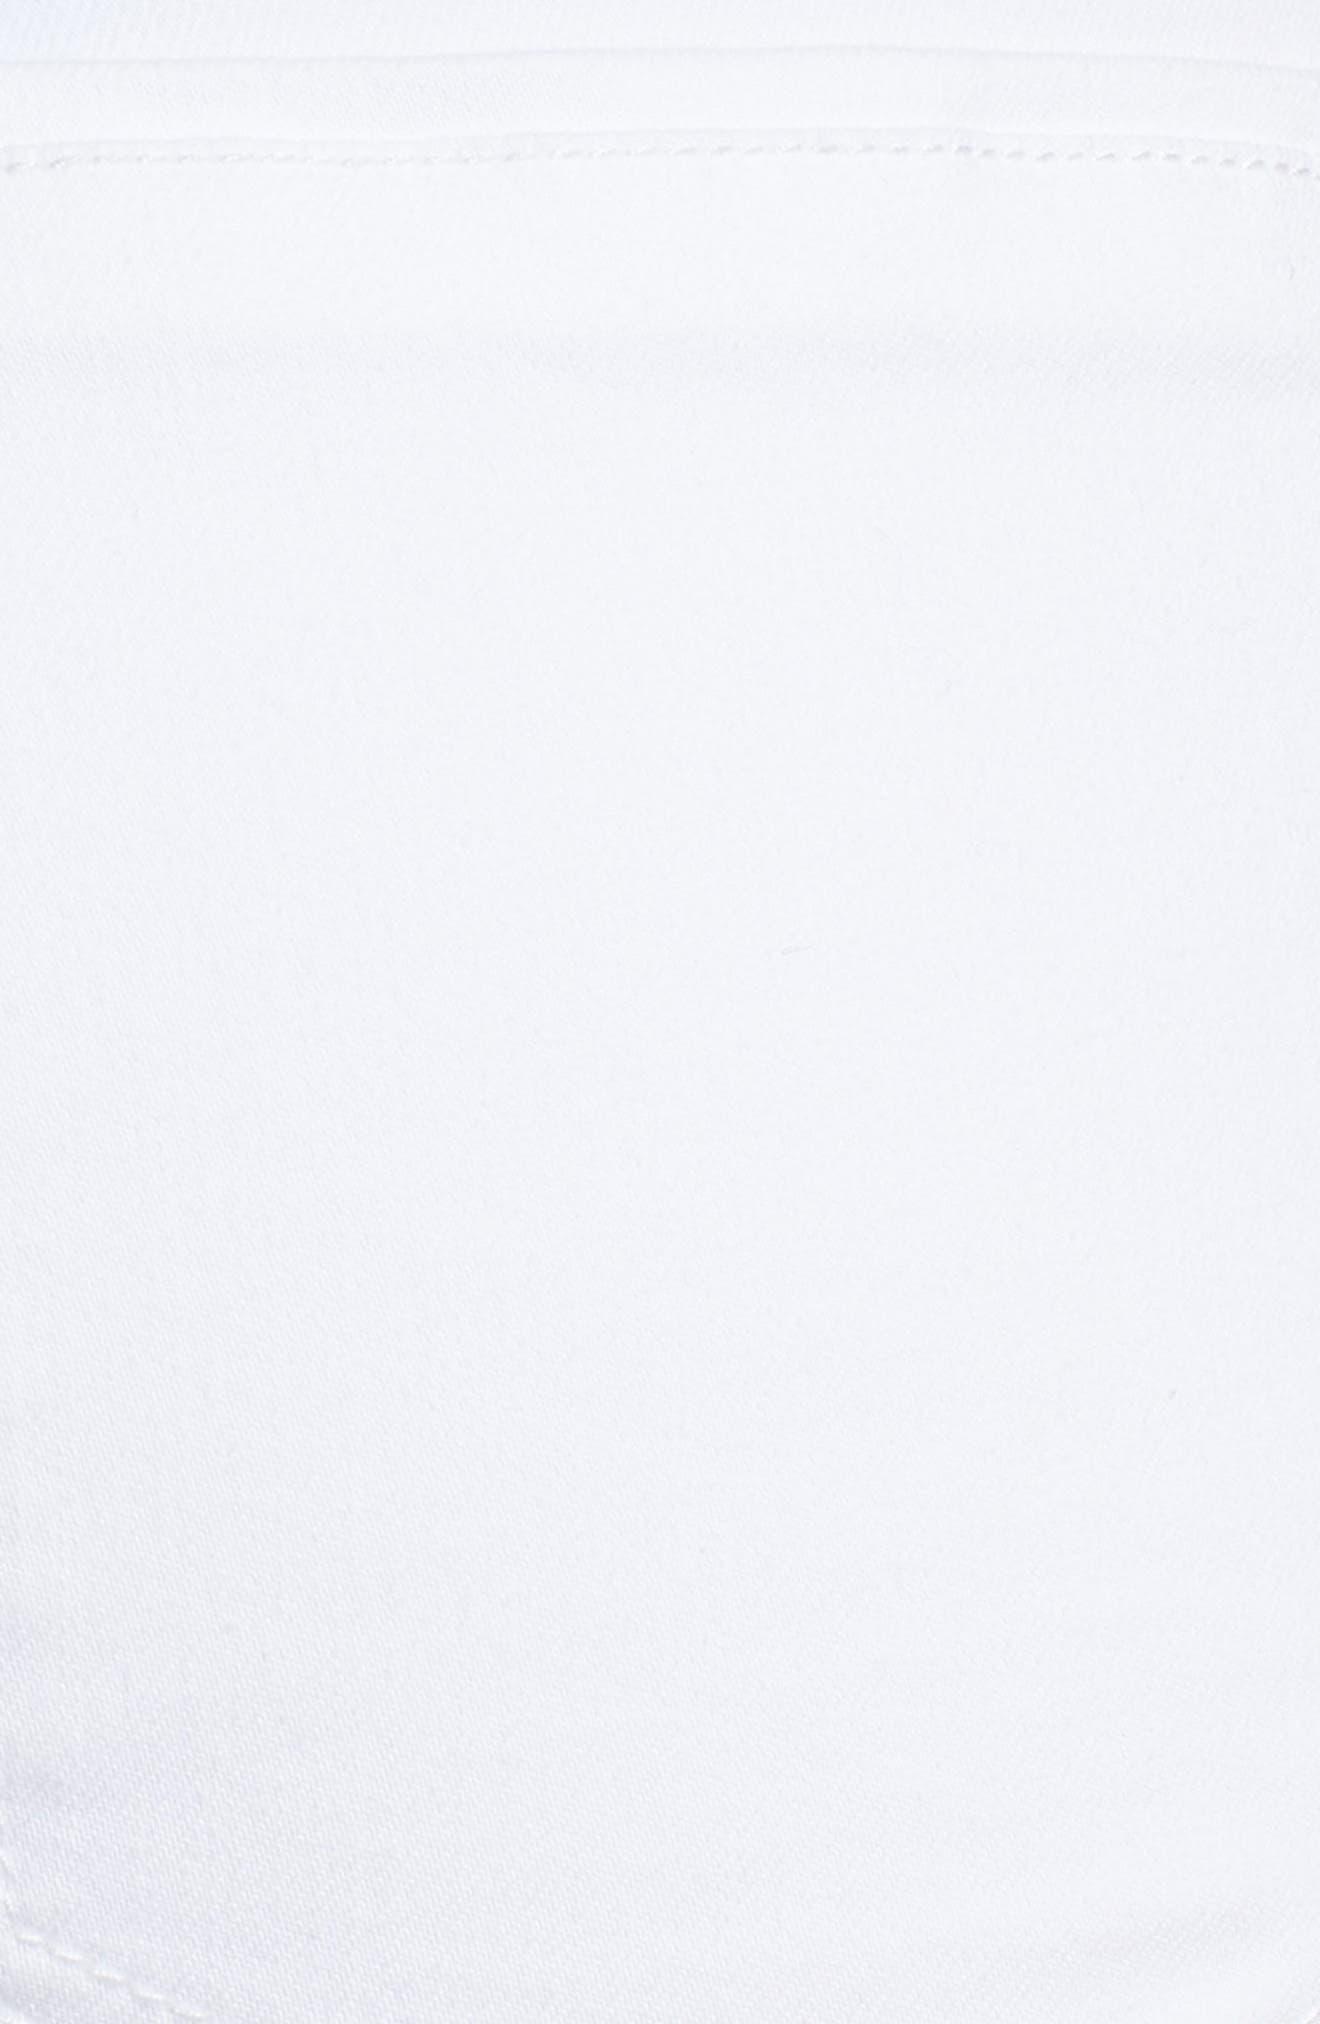 Ab-solution White Bermuda Shorts,                             Alternate thumbnail 6, color,                             OPTIC WHITE